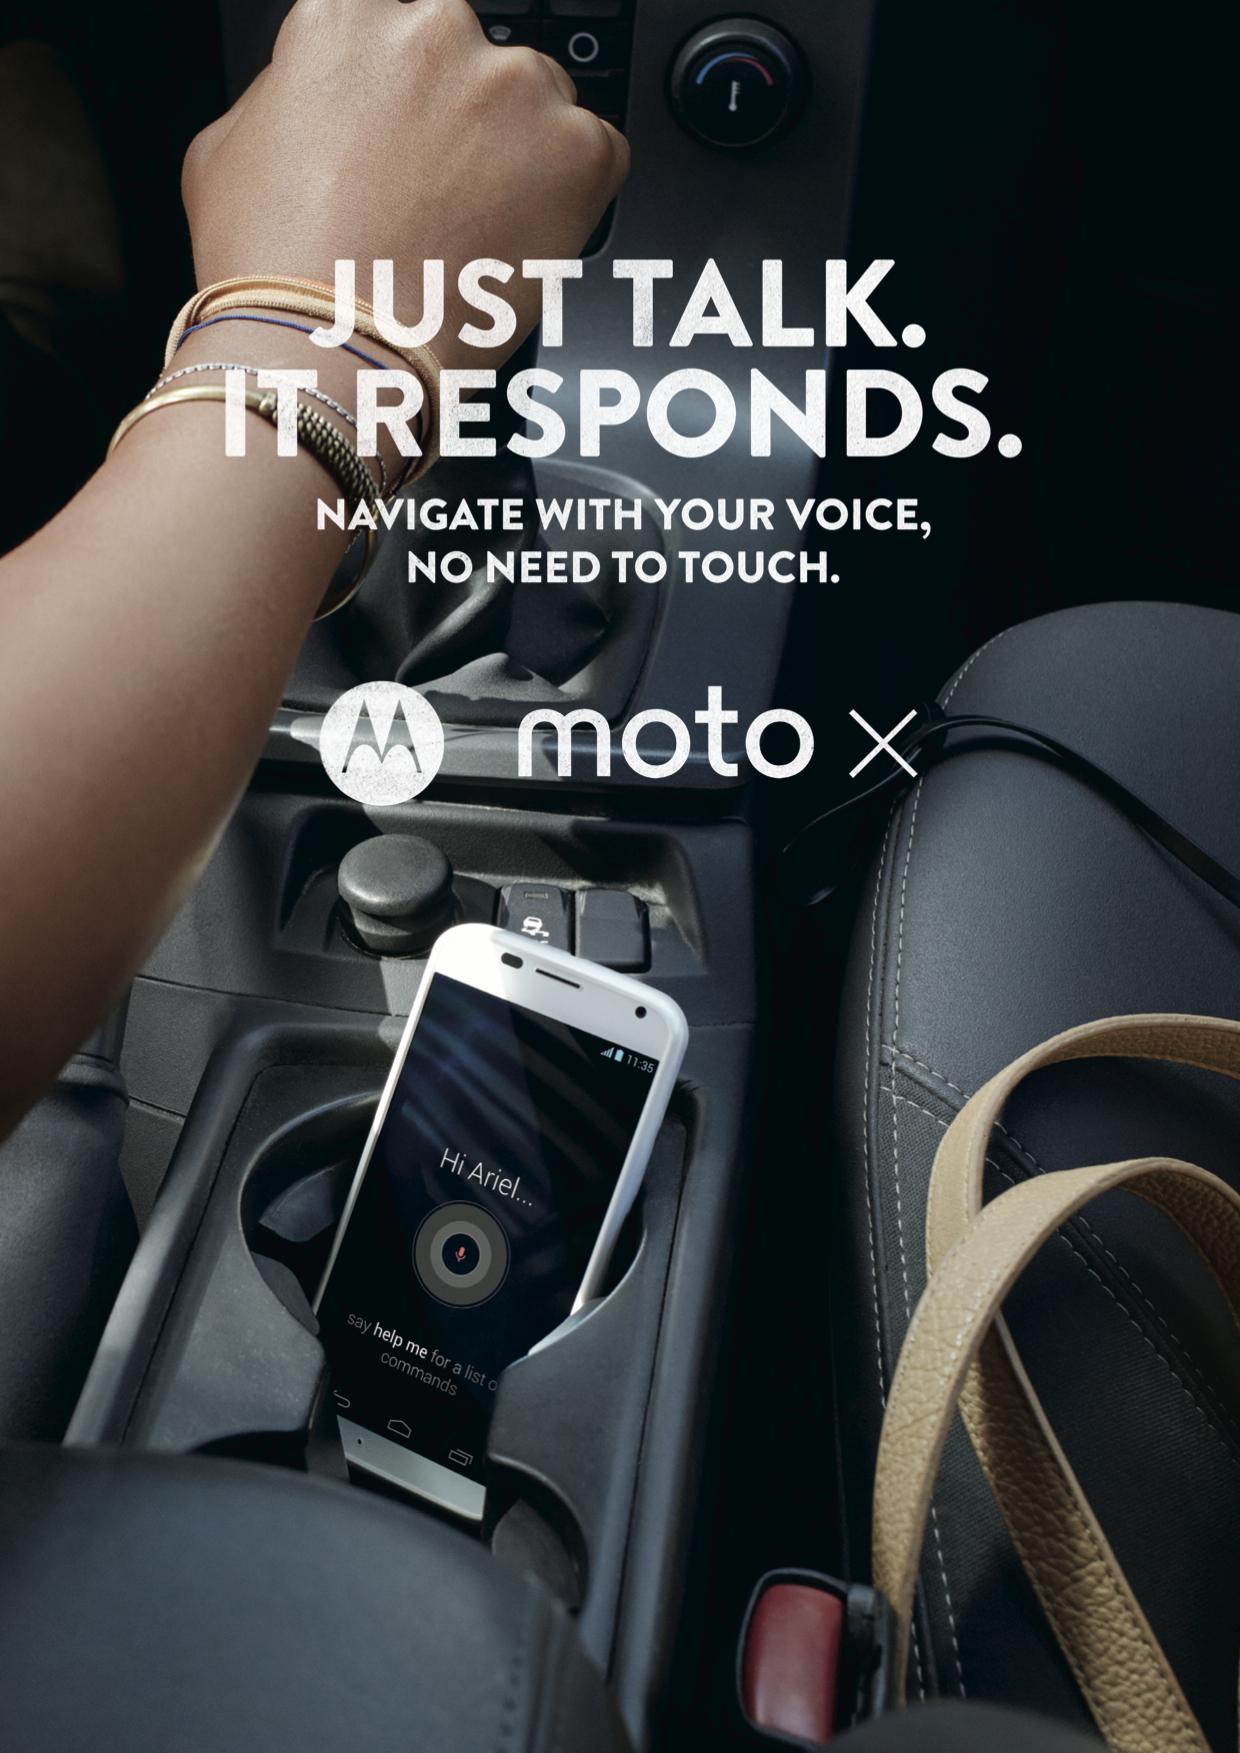 MOT_0019_GOOH_Car_A4.jpg